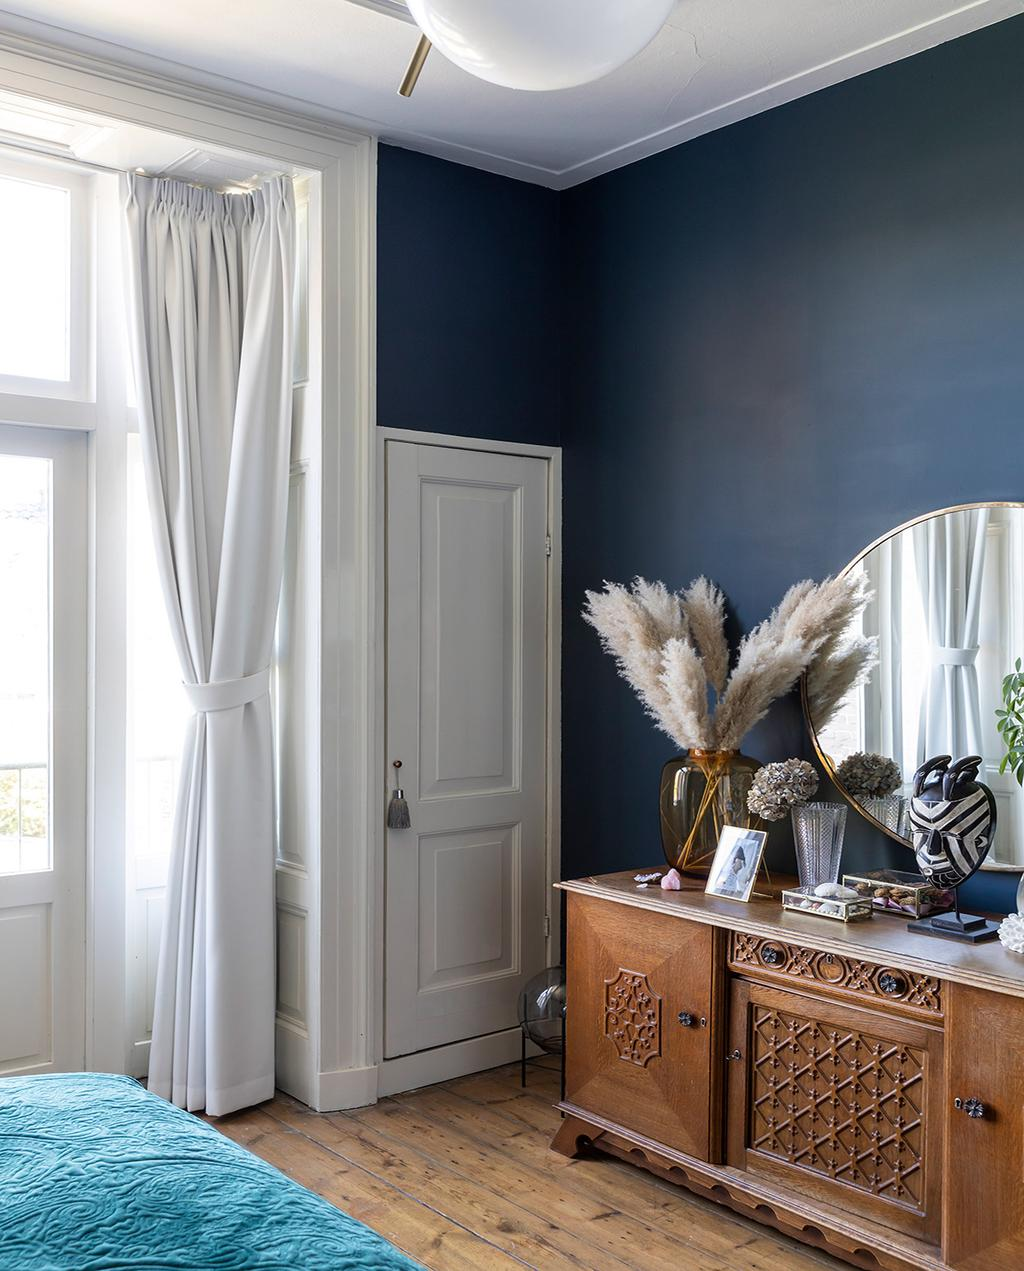 vtwonen 01-2021 | slaapkamer met donkerblauwe muur, kast met pluimen in vaas